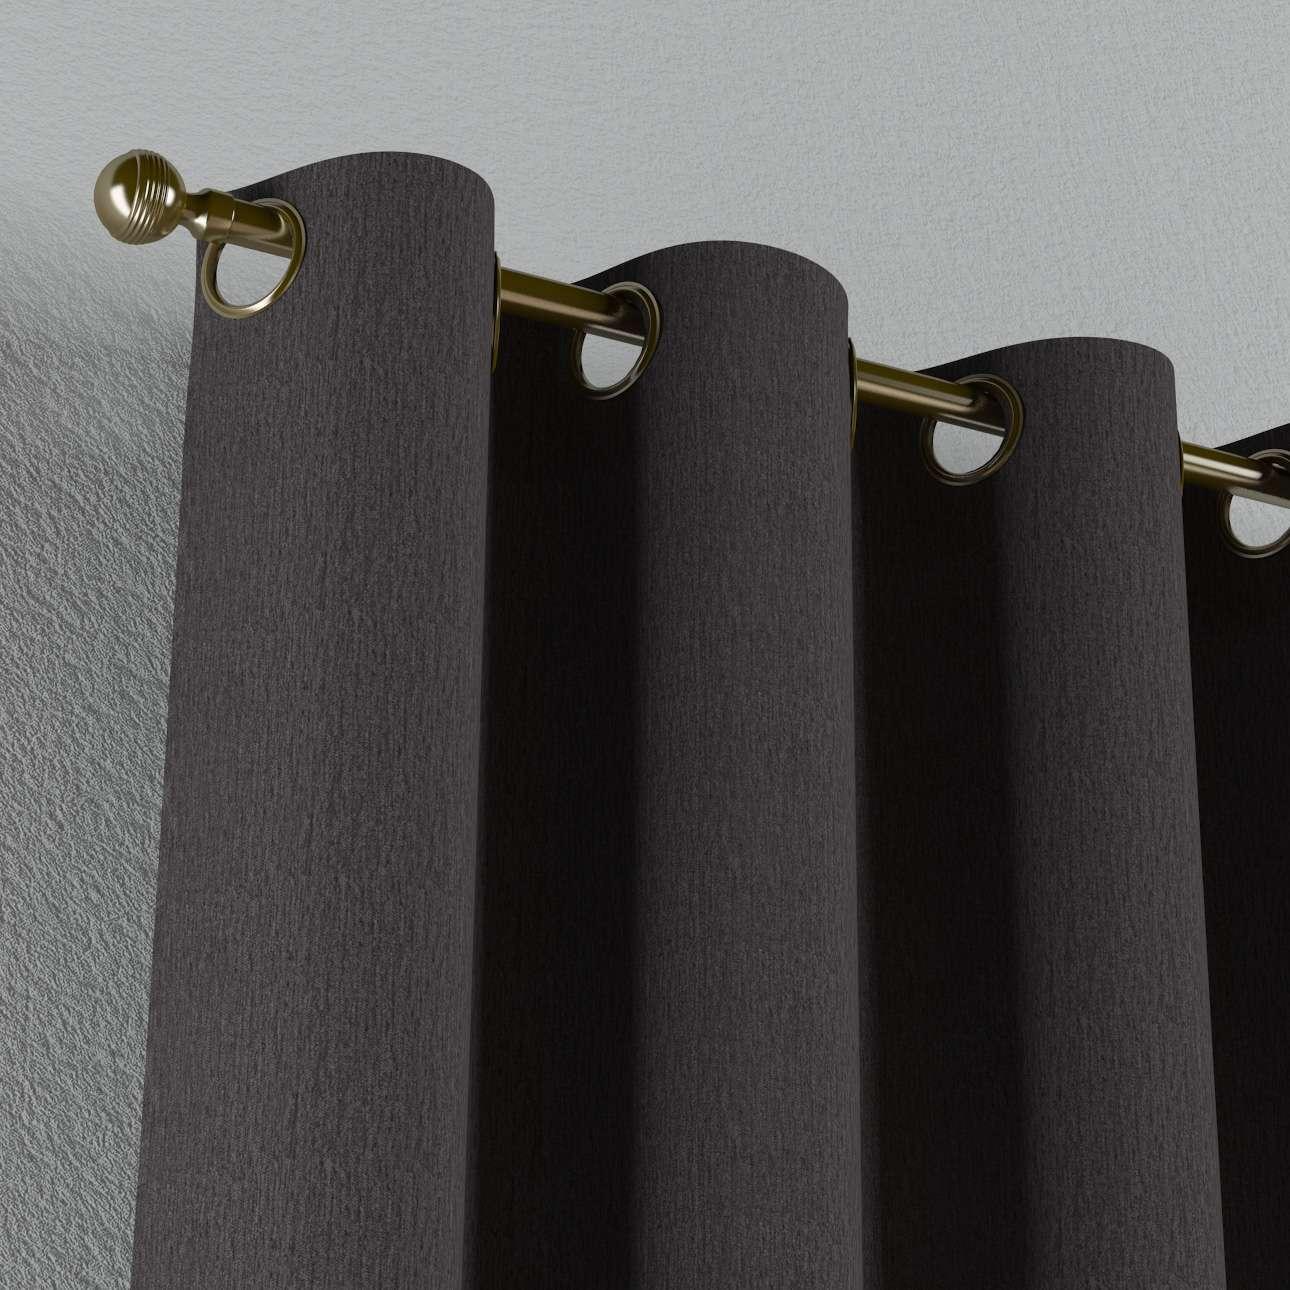 Gardin med øskner 130 x 260 cm fra kollektionen Chenille, Stof: 702-20